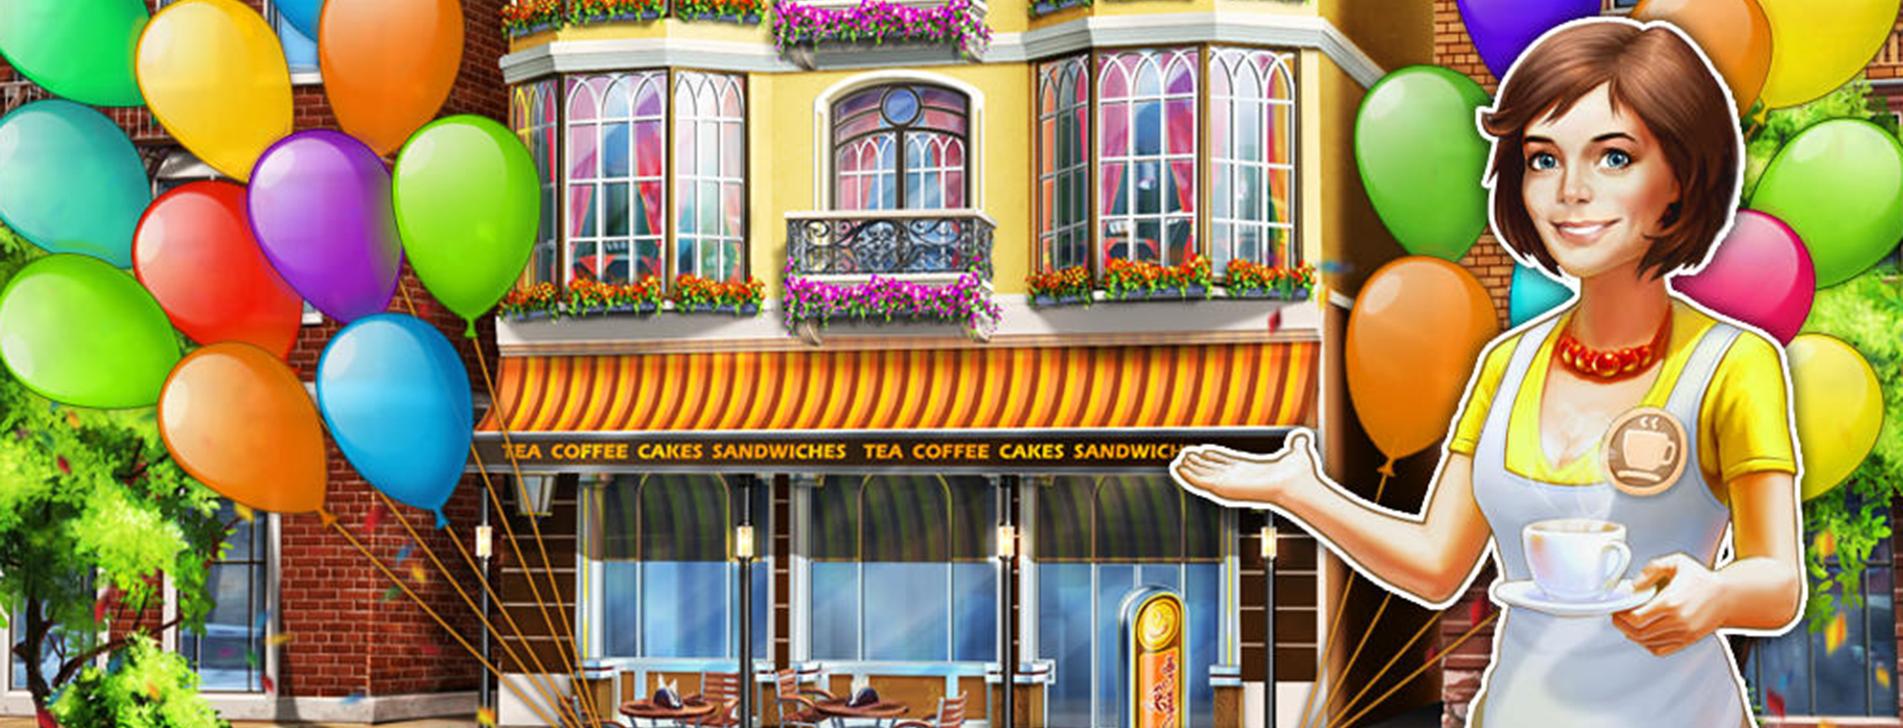 Локализация игры «Кофейня: бизнес-симулятор кафе»